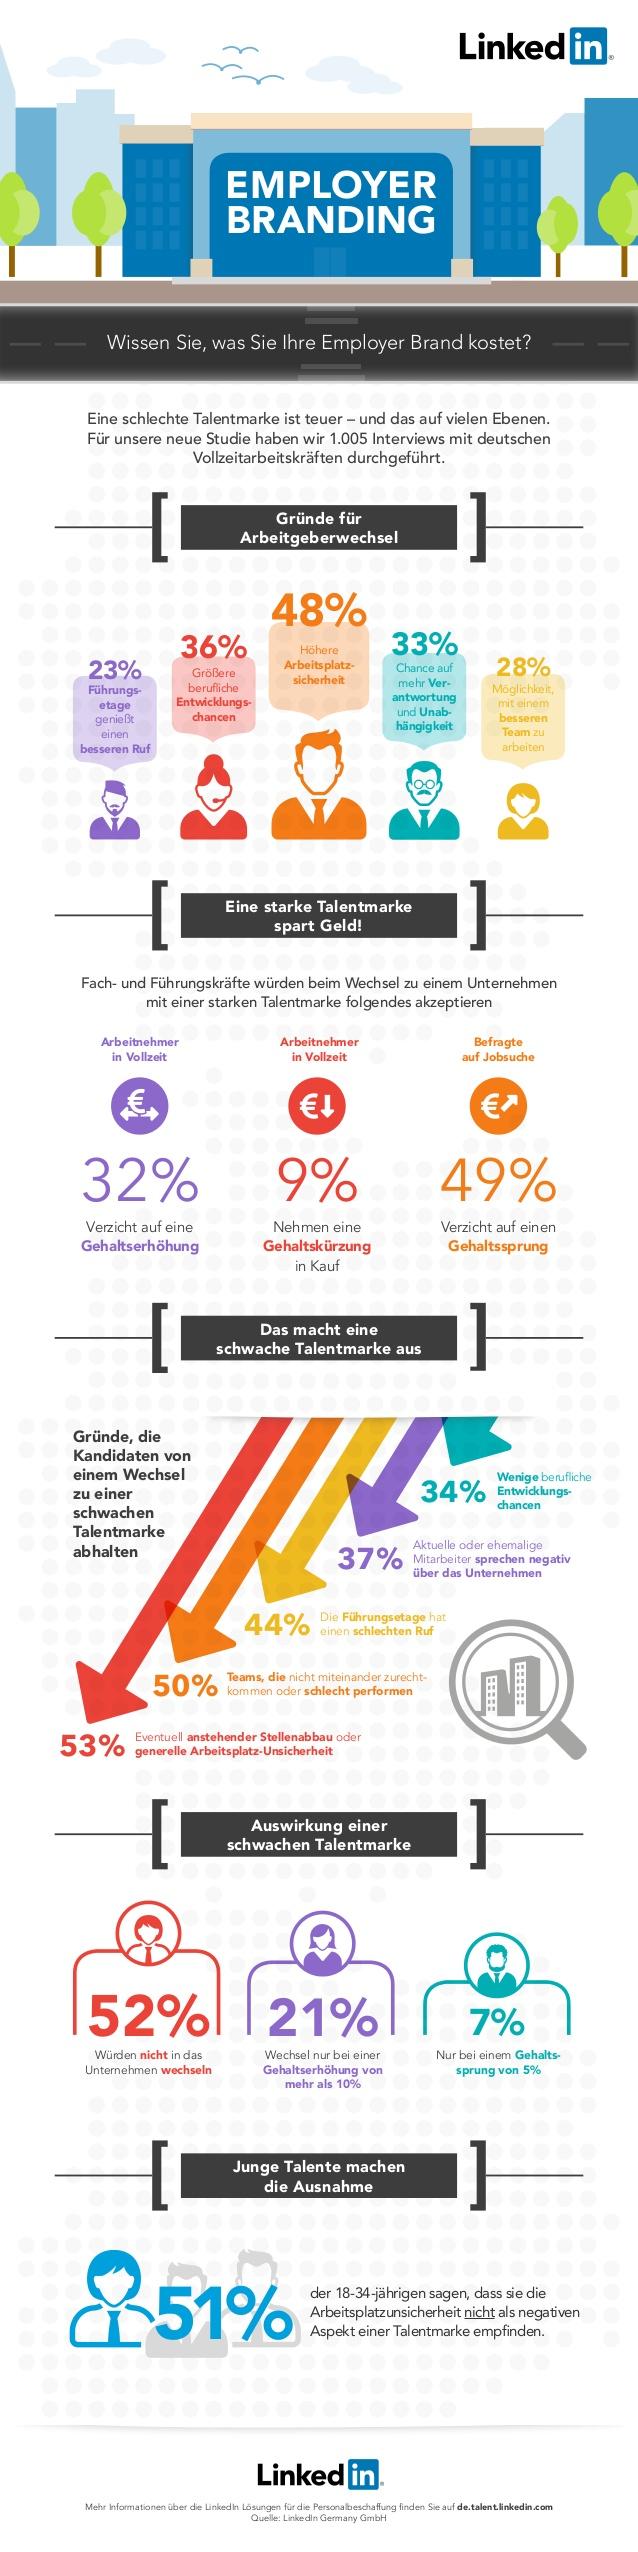 LinkedIn Studie zum Thema Arbeitgebermarke